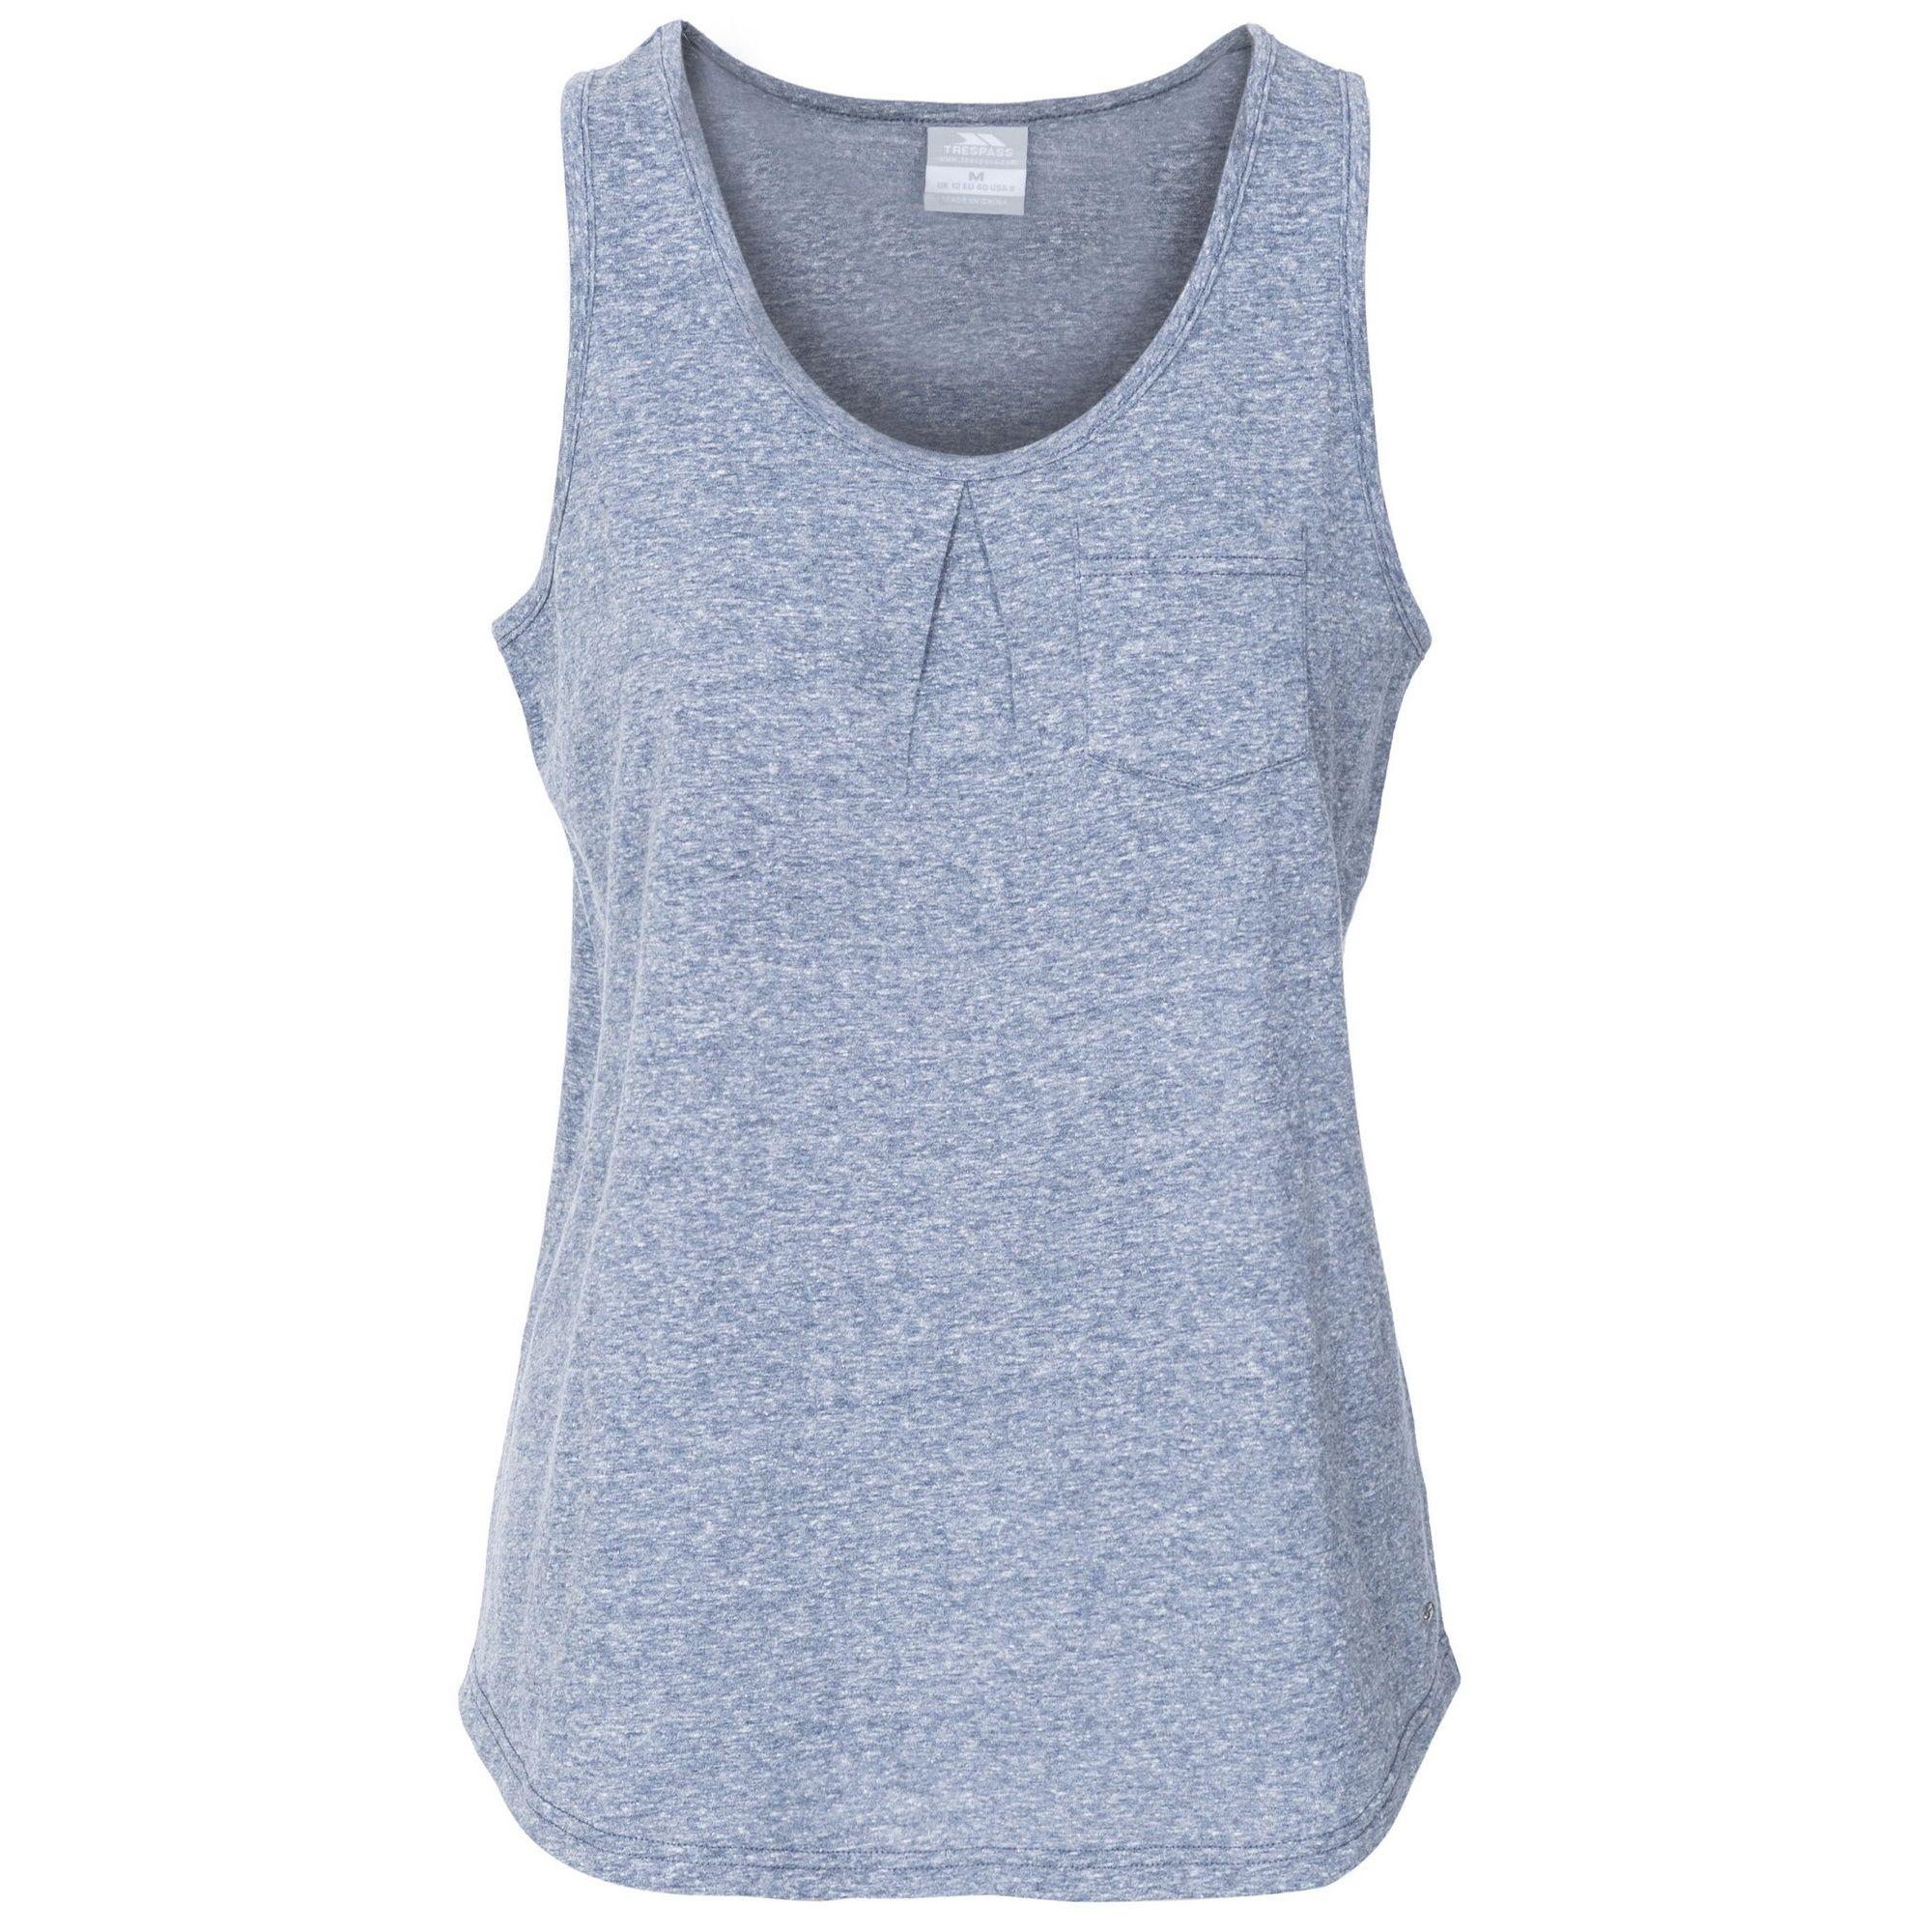 Trespass Womens/Ladies Fidget Sleeveless Vest